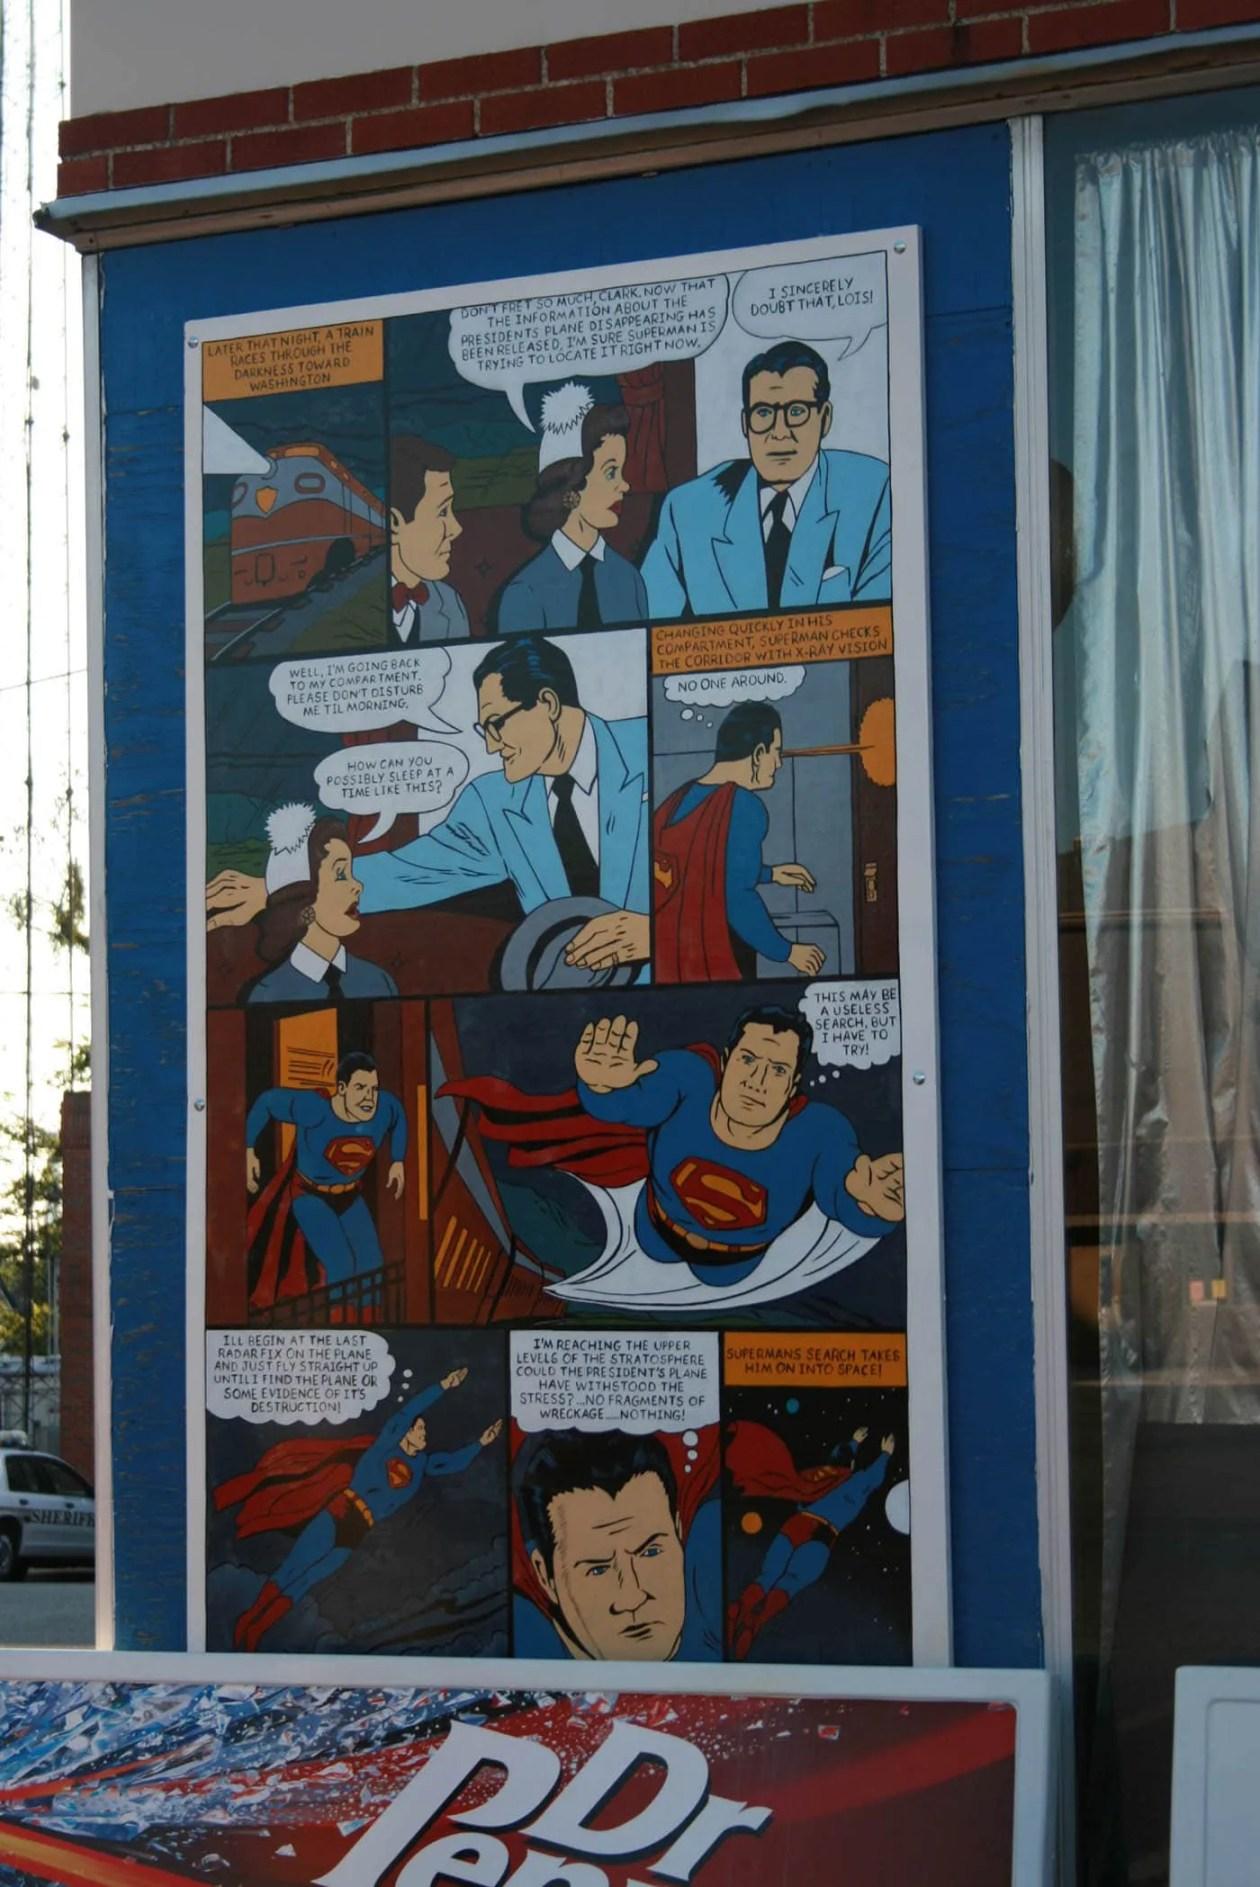 Comic Book in Superman Square in Metropolis, Illinois